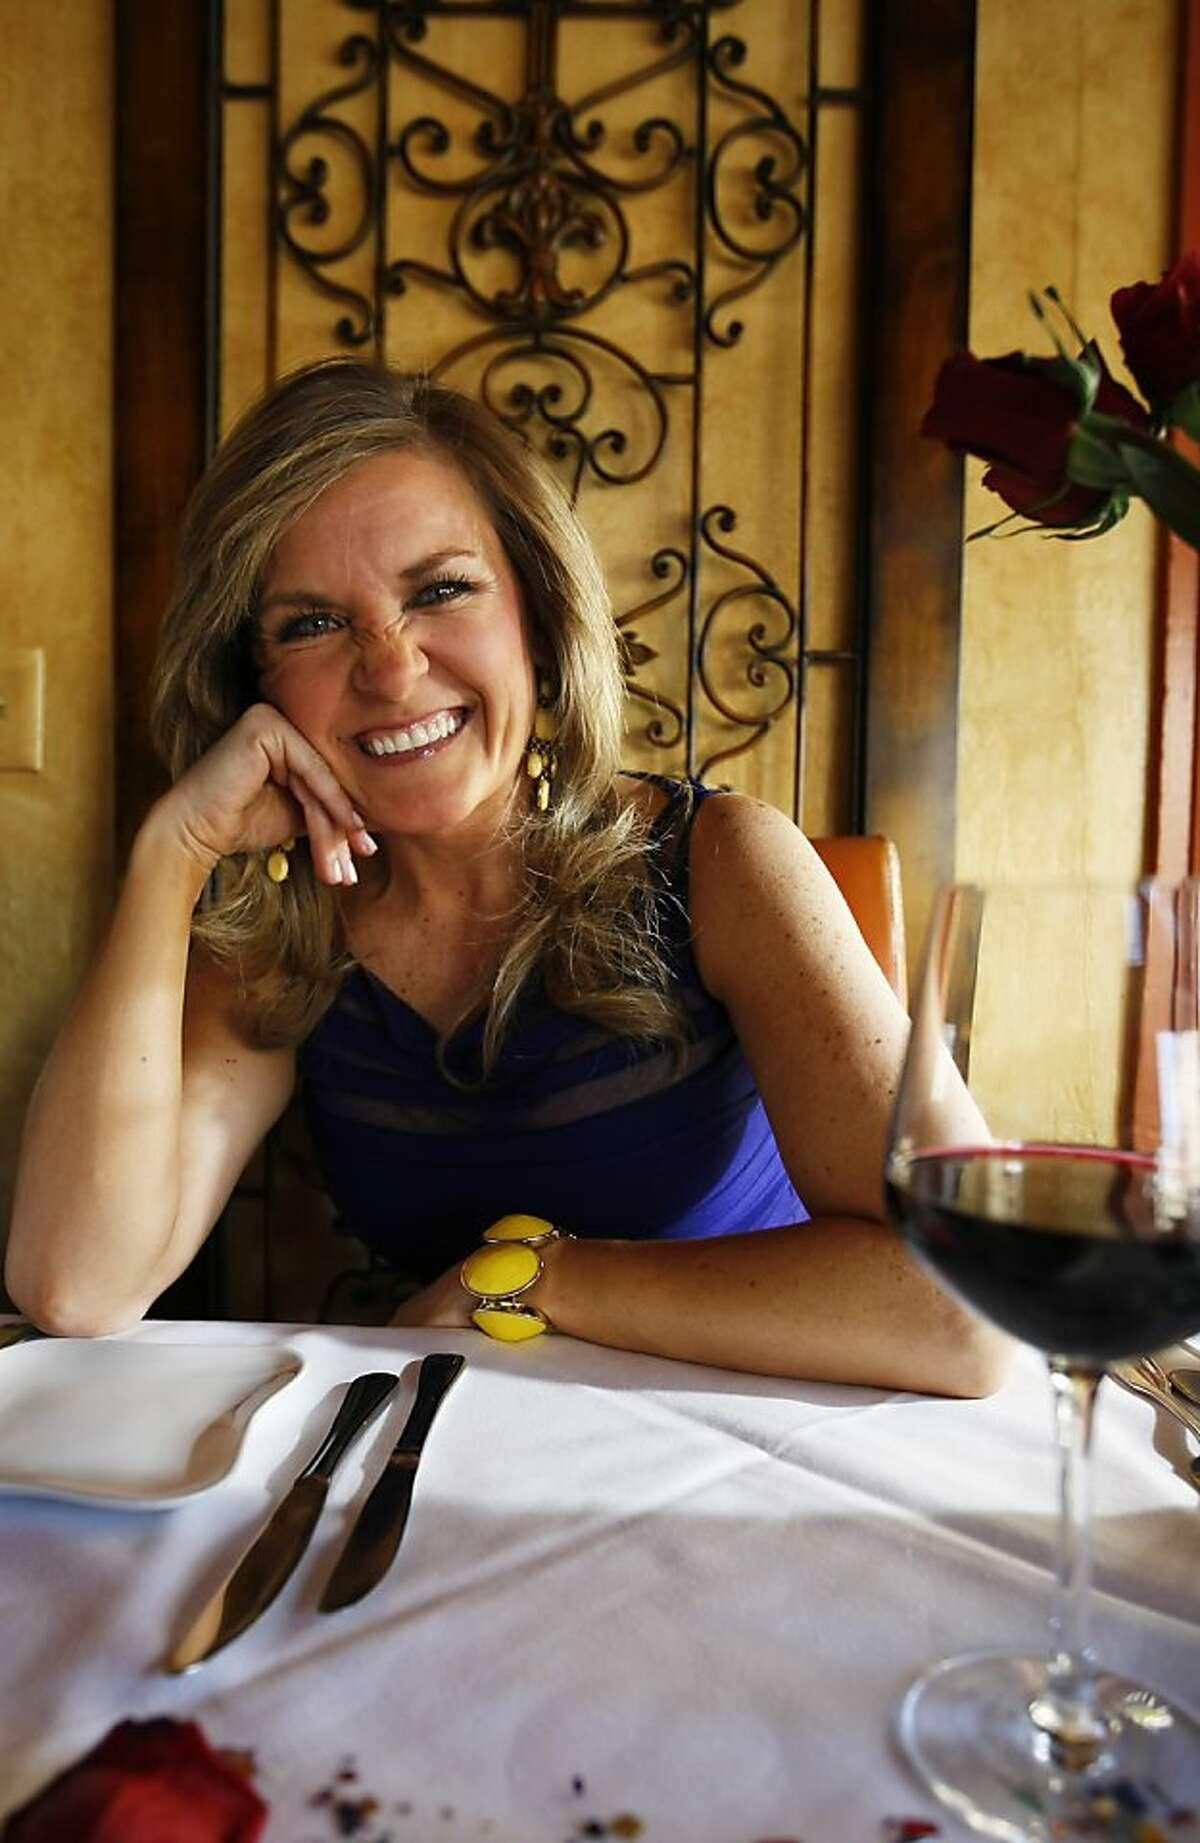 Fabiola Kramsky at one of her favourite restaurants, Allegro Romano on Thursday, June 6, 2013, in San Francisco, Calif.